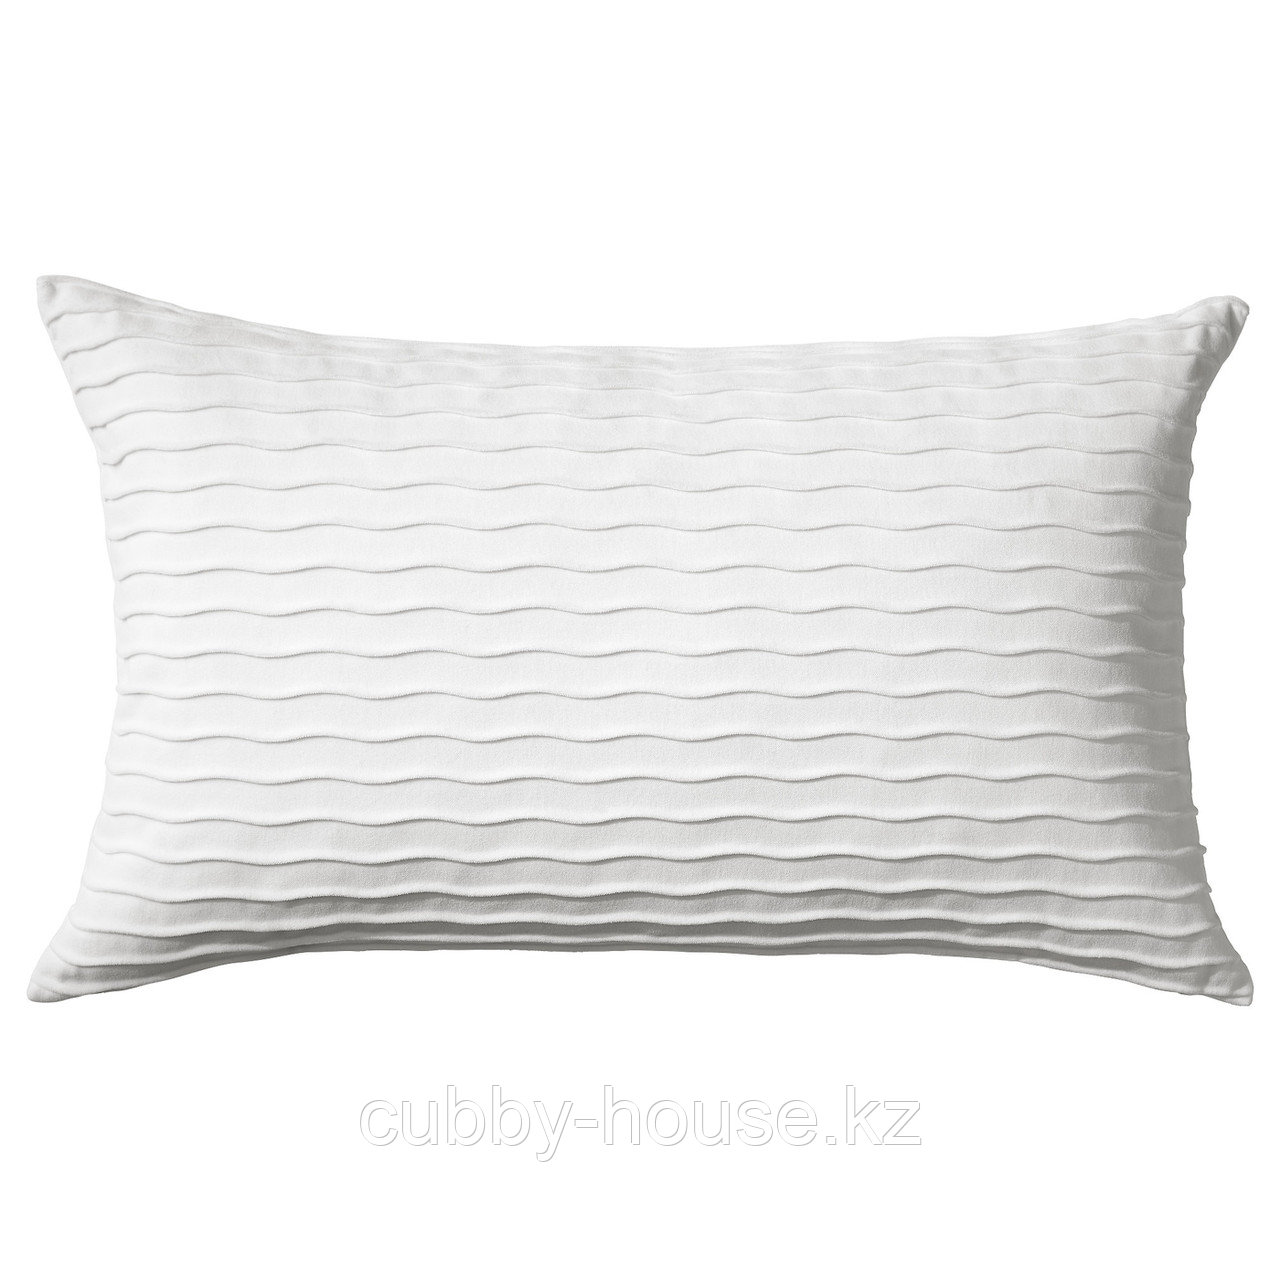 ВЭНДЕРОТ Подушка, белый, 40x65 см